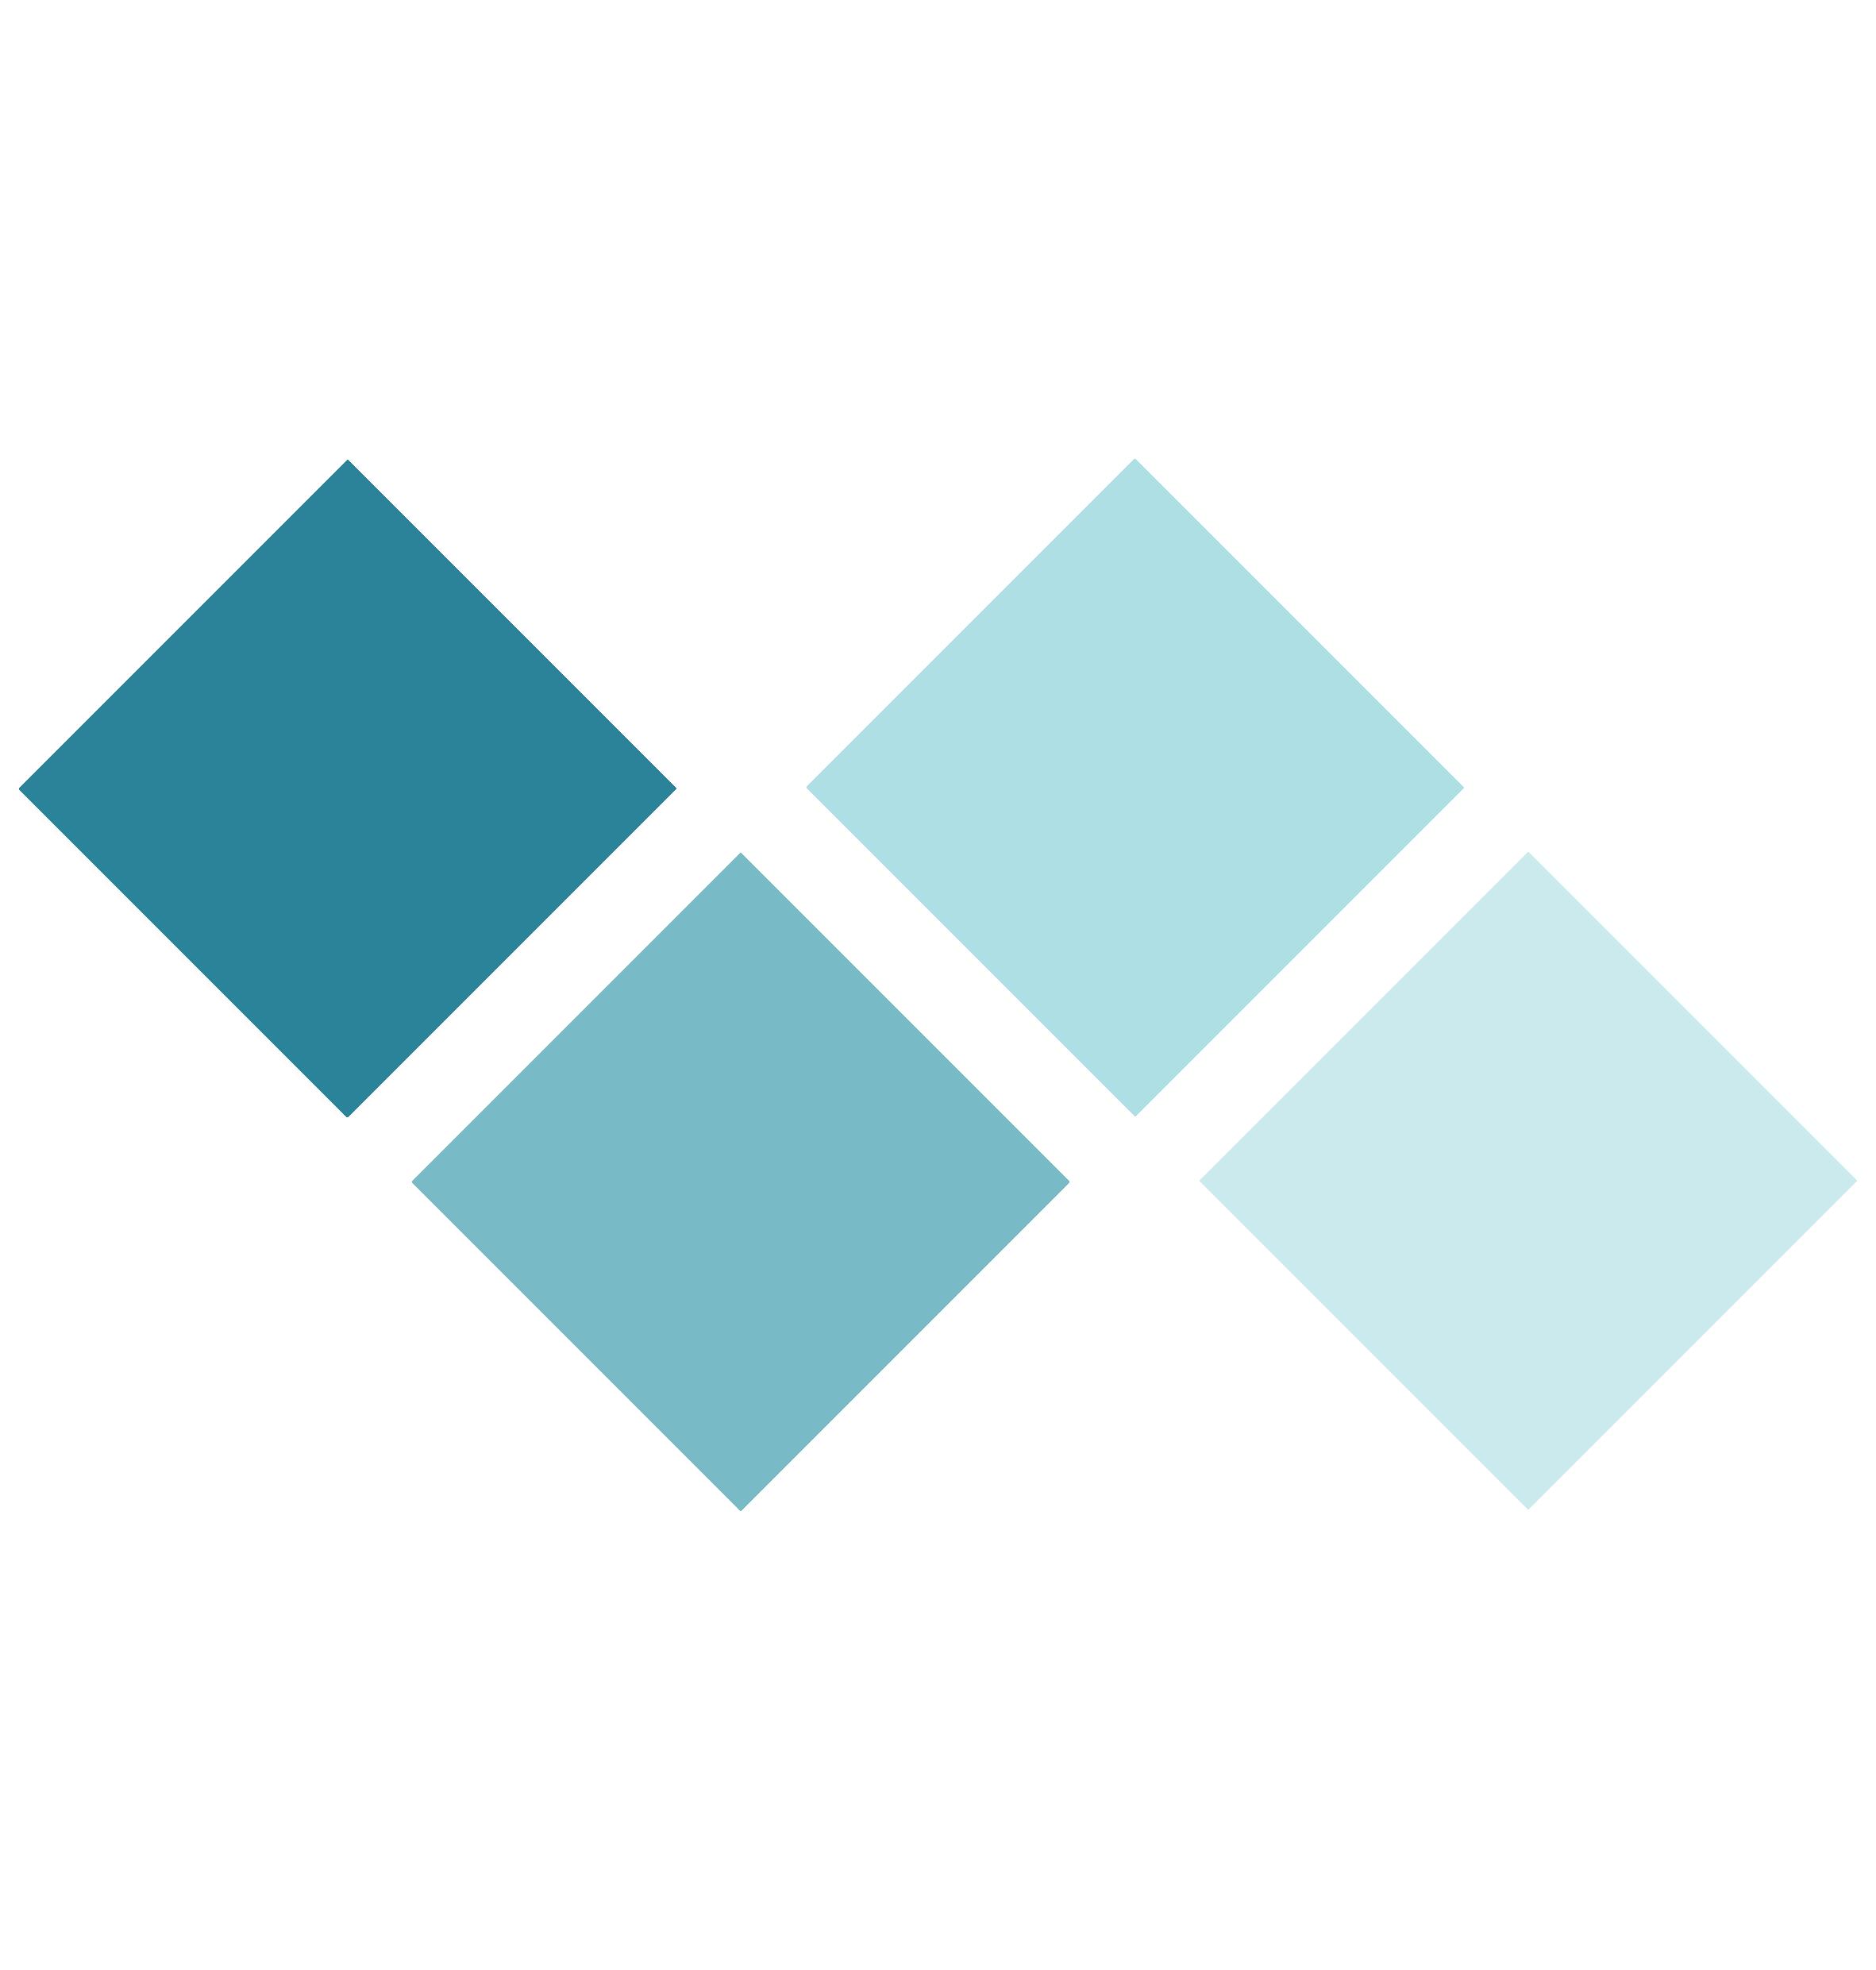 Audit trail icon